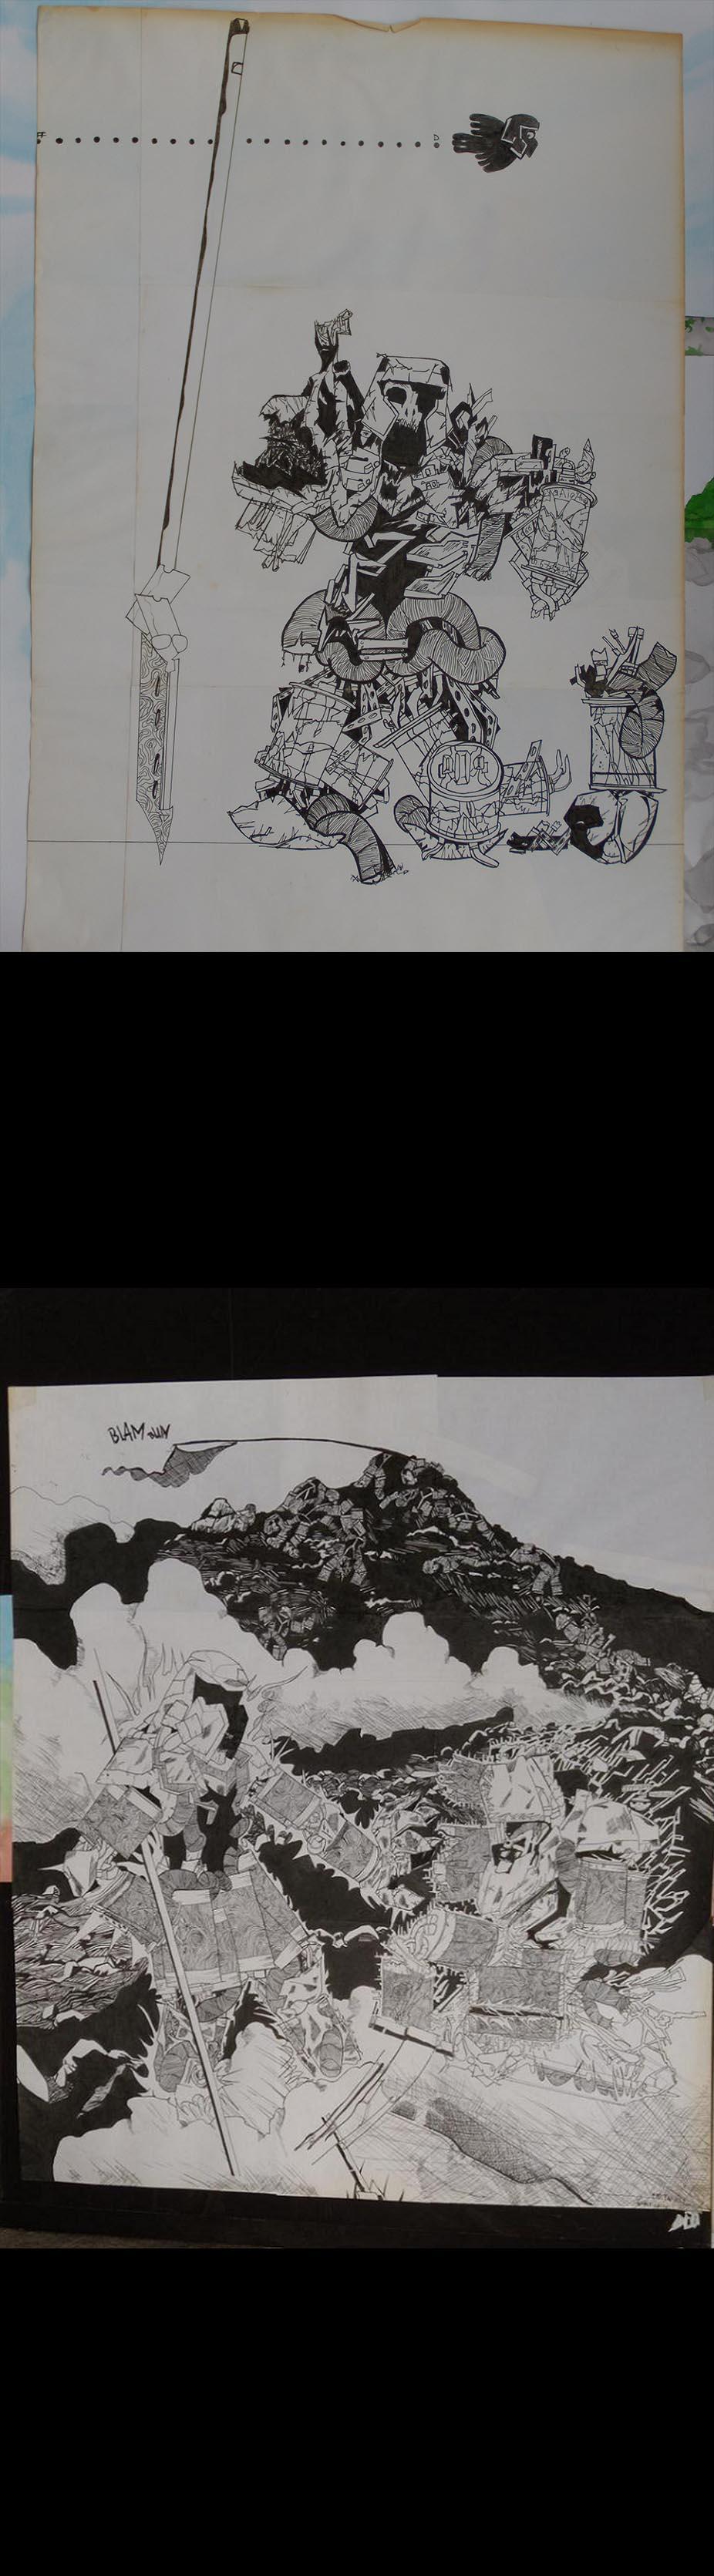 [inspi] Timeline - vos vieux dessins - Page 4 Archiv14